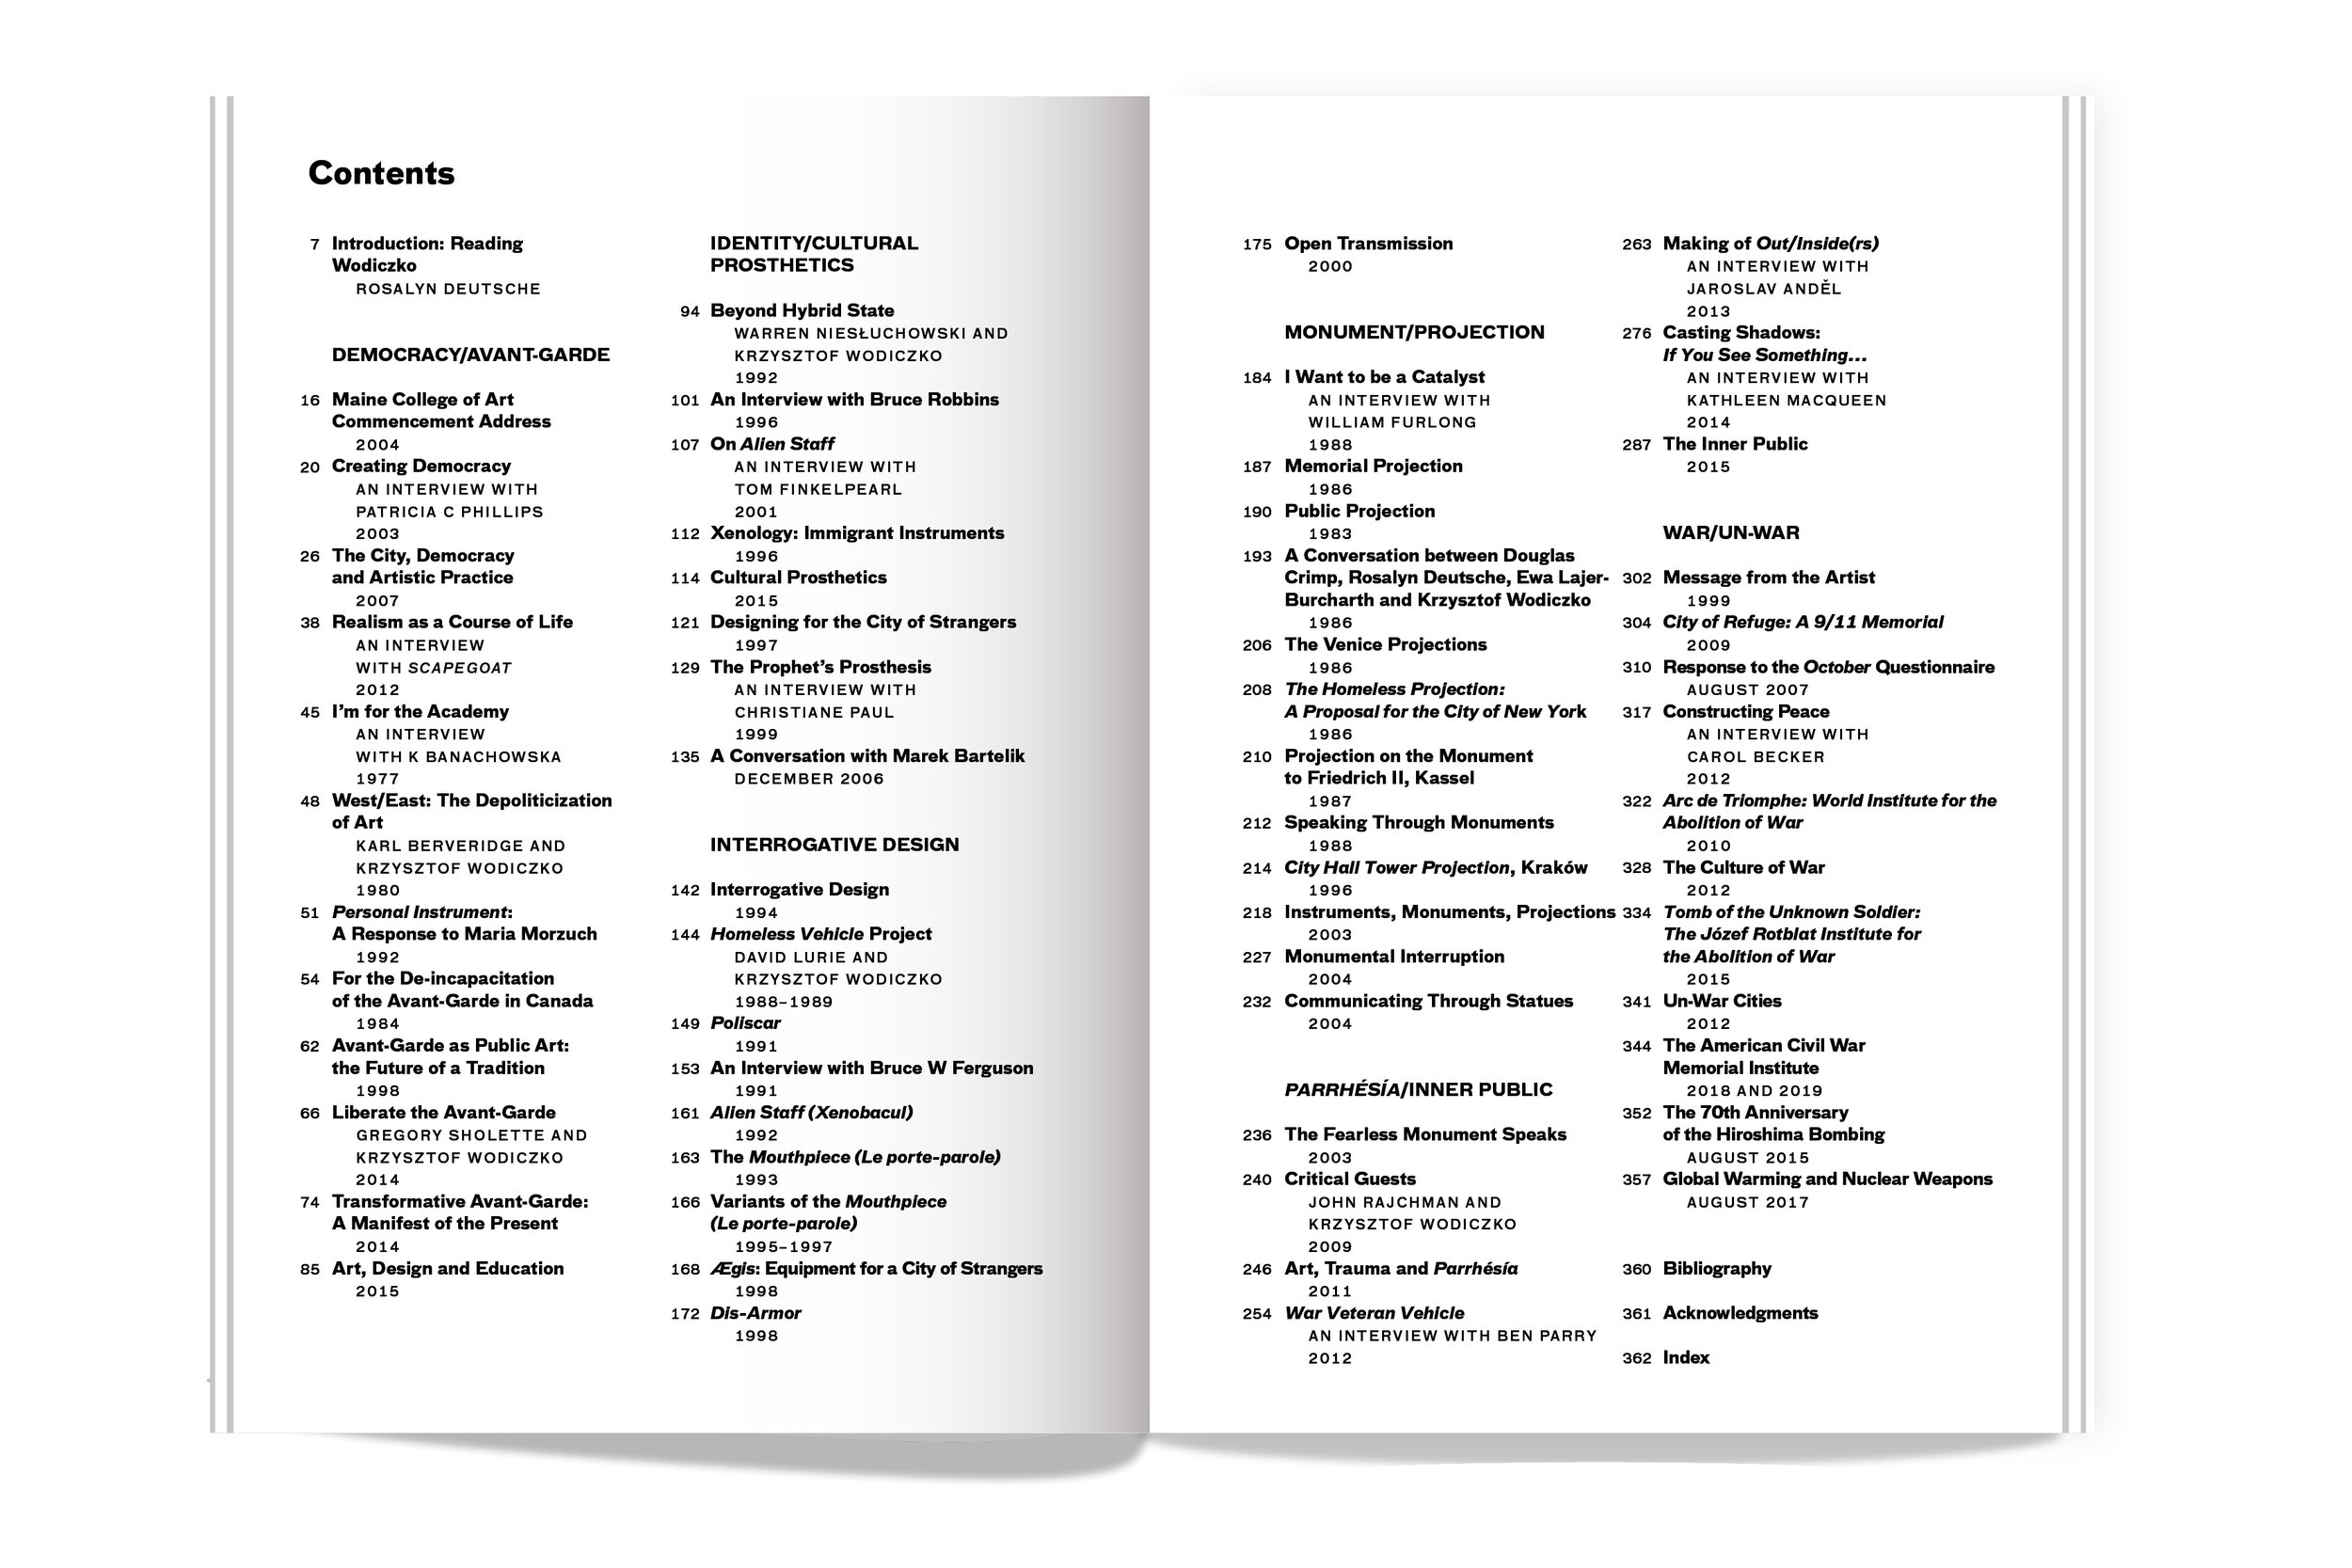 BDP_Transformative Avant-Garde & Other Writings_Inners_V2-001.jpg